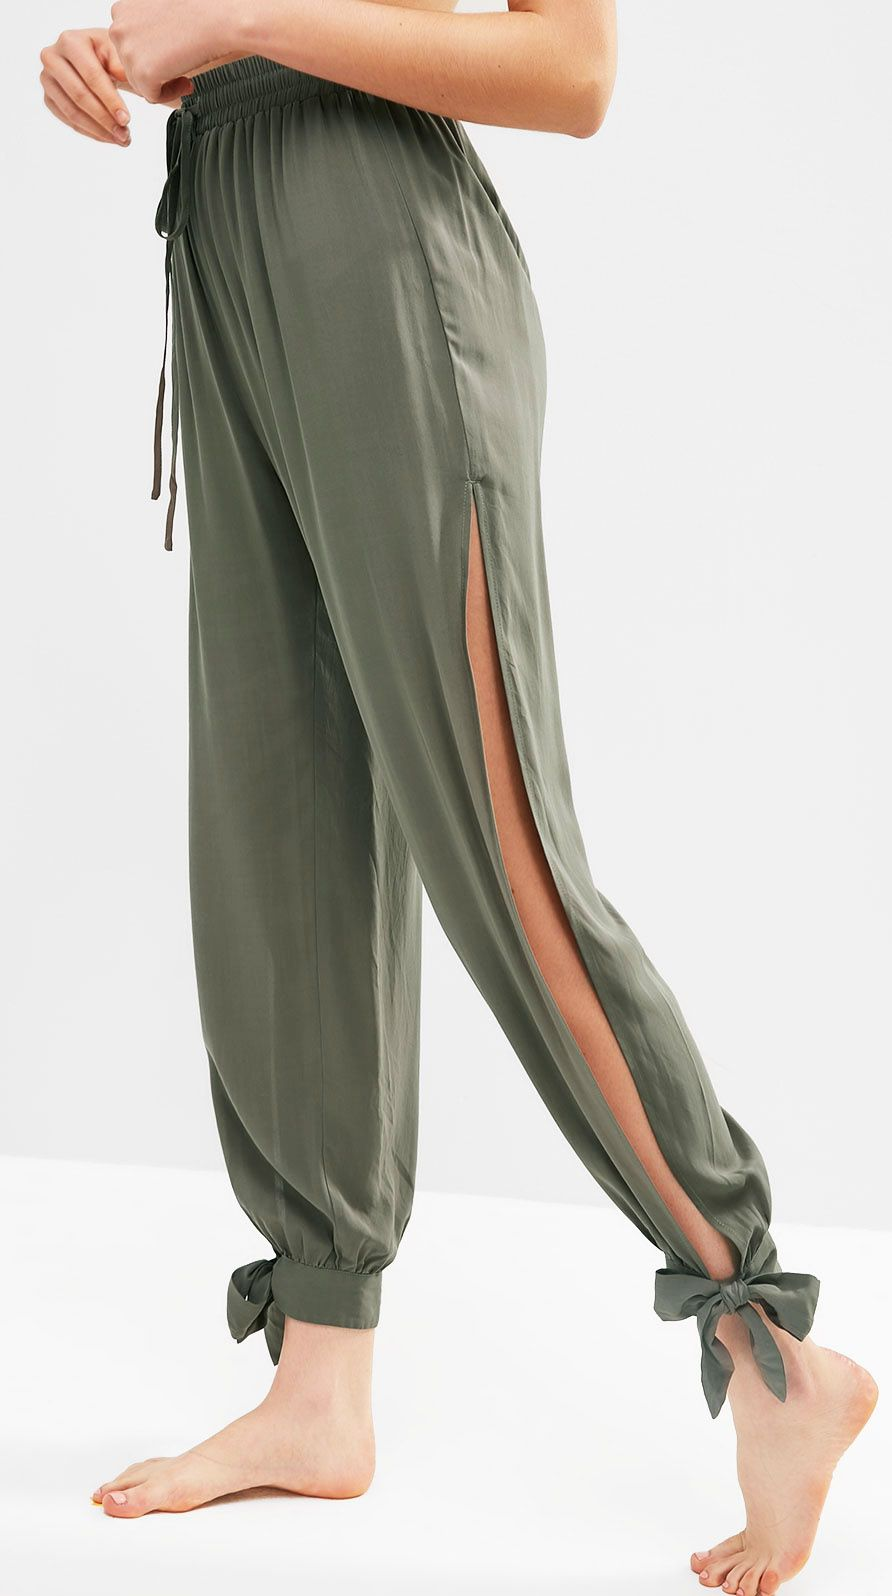 Cute Tie Ankle Split Pants Tea Green Women Summer Pants Cover Up